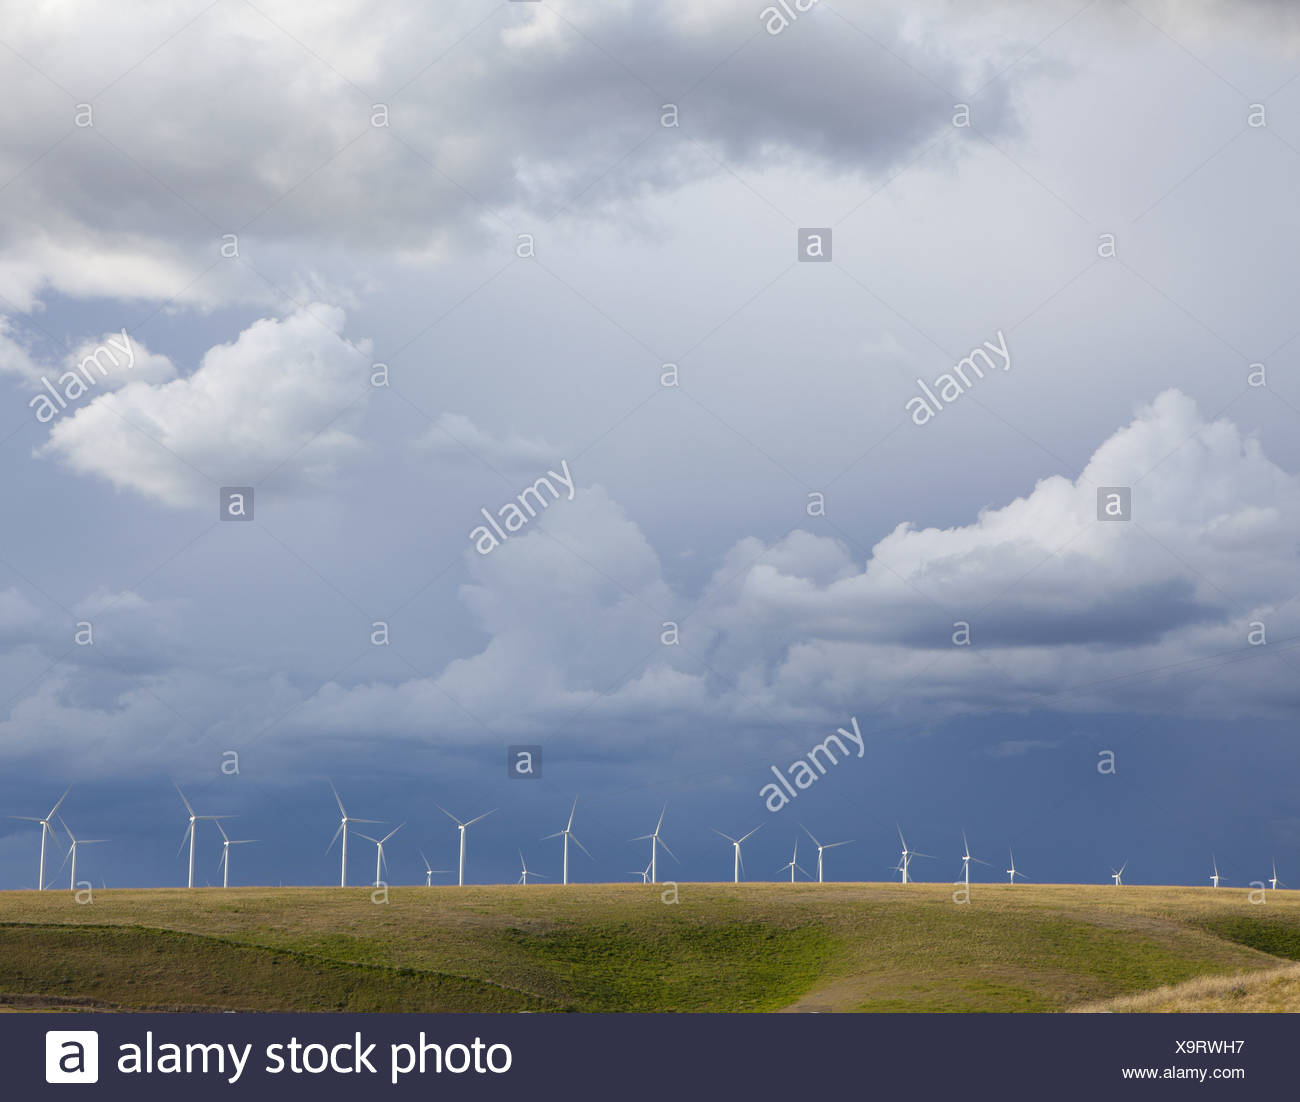 Washington USA line of wind turbines on ridge against stormy sky - Stock Image